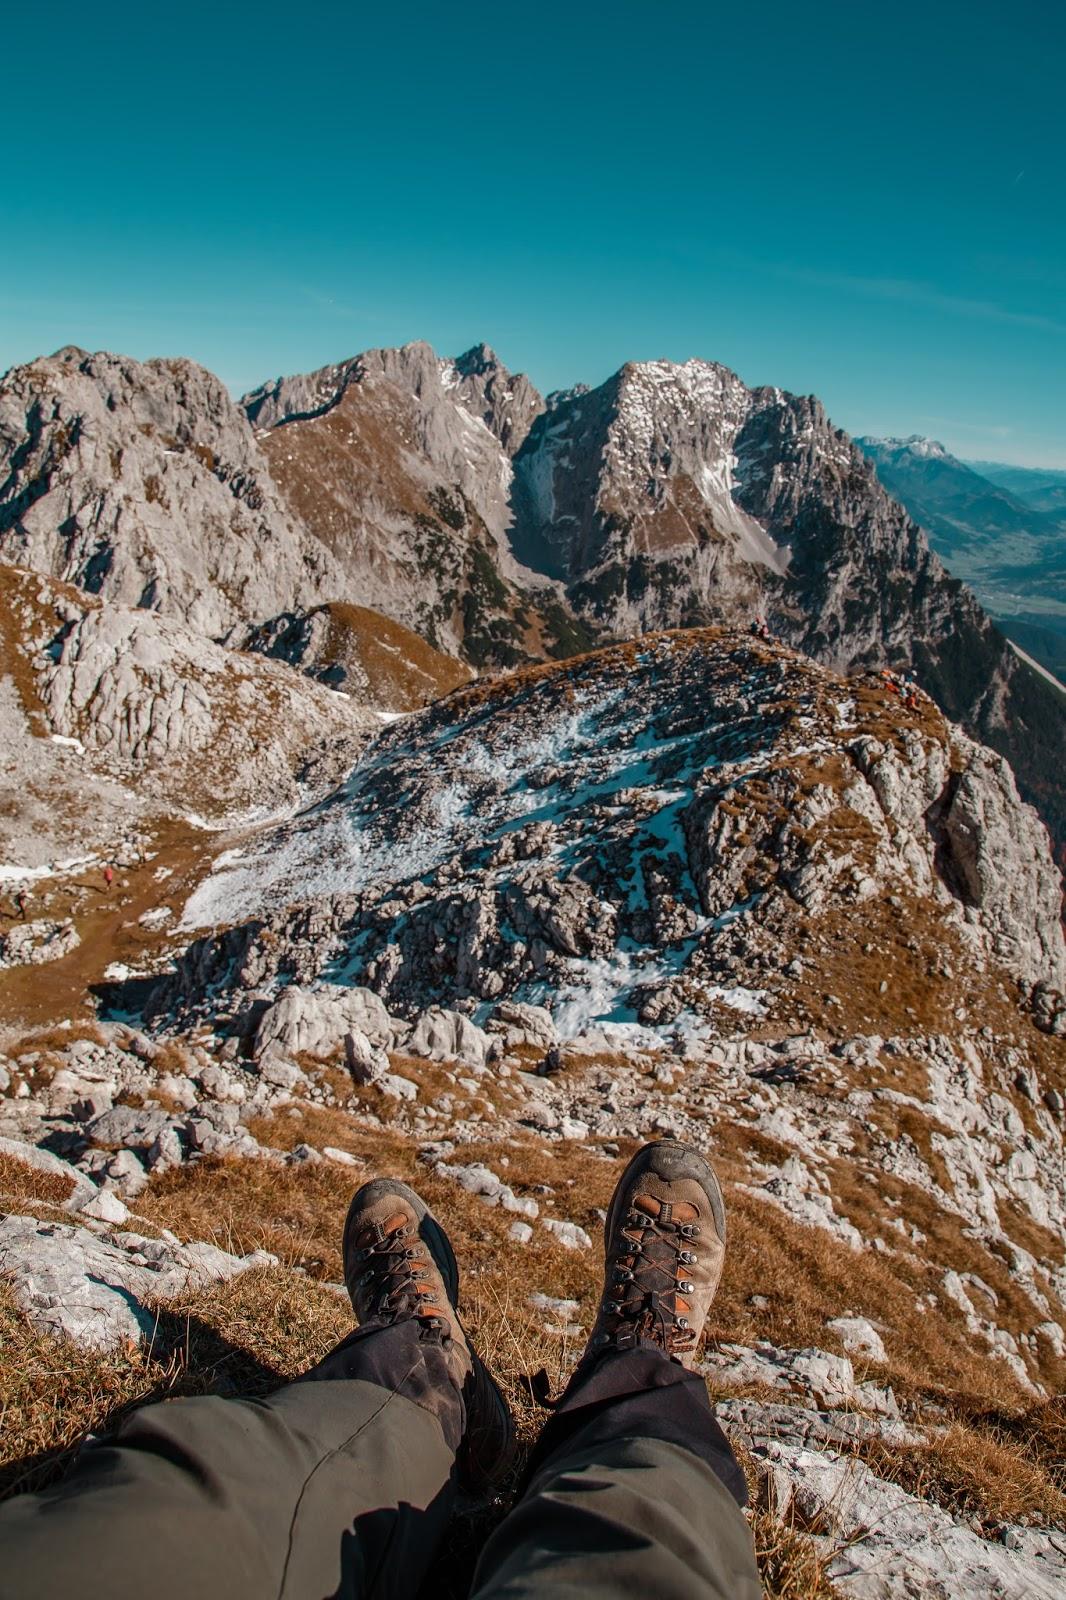 Bergtour Scheffauer  Wandern Wilder Kaiser  leichter Gipfel im Wilden Kaiser  Wandern-Tirol 10